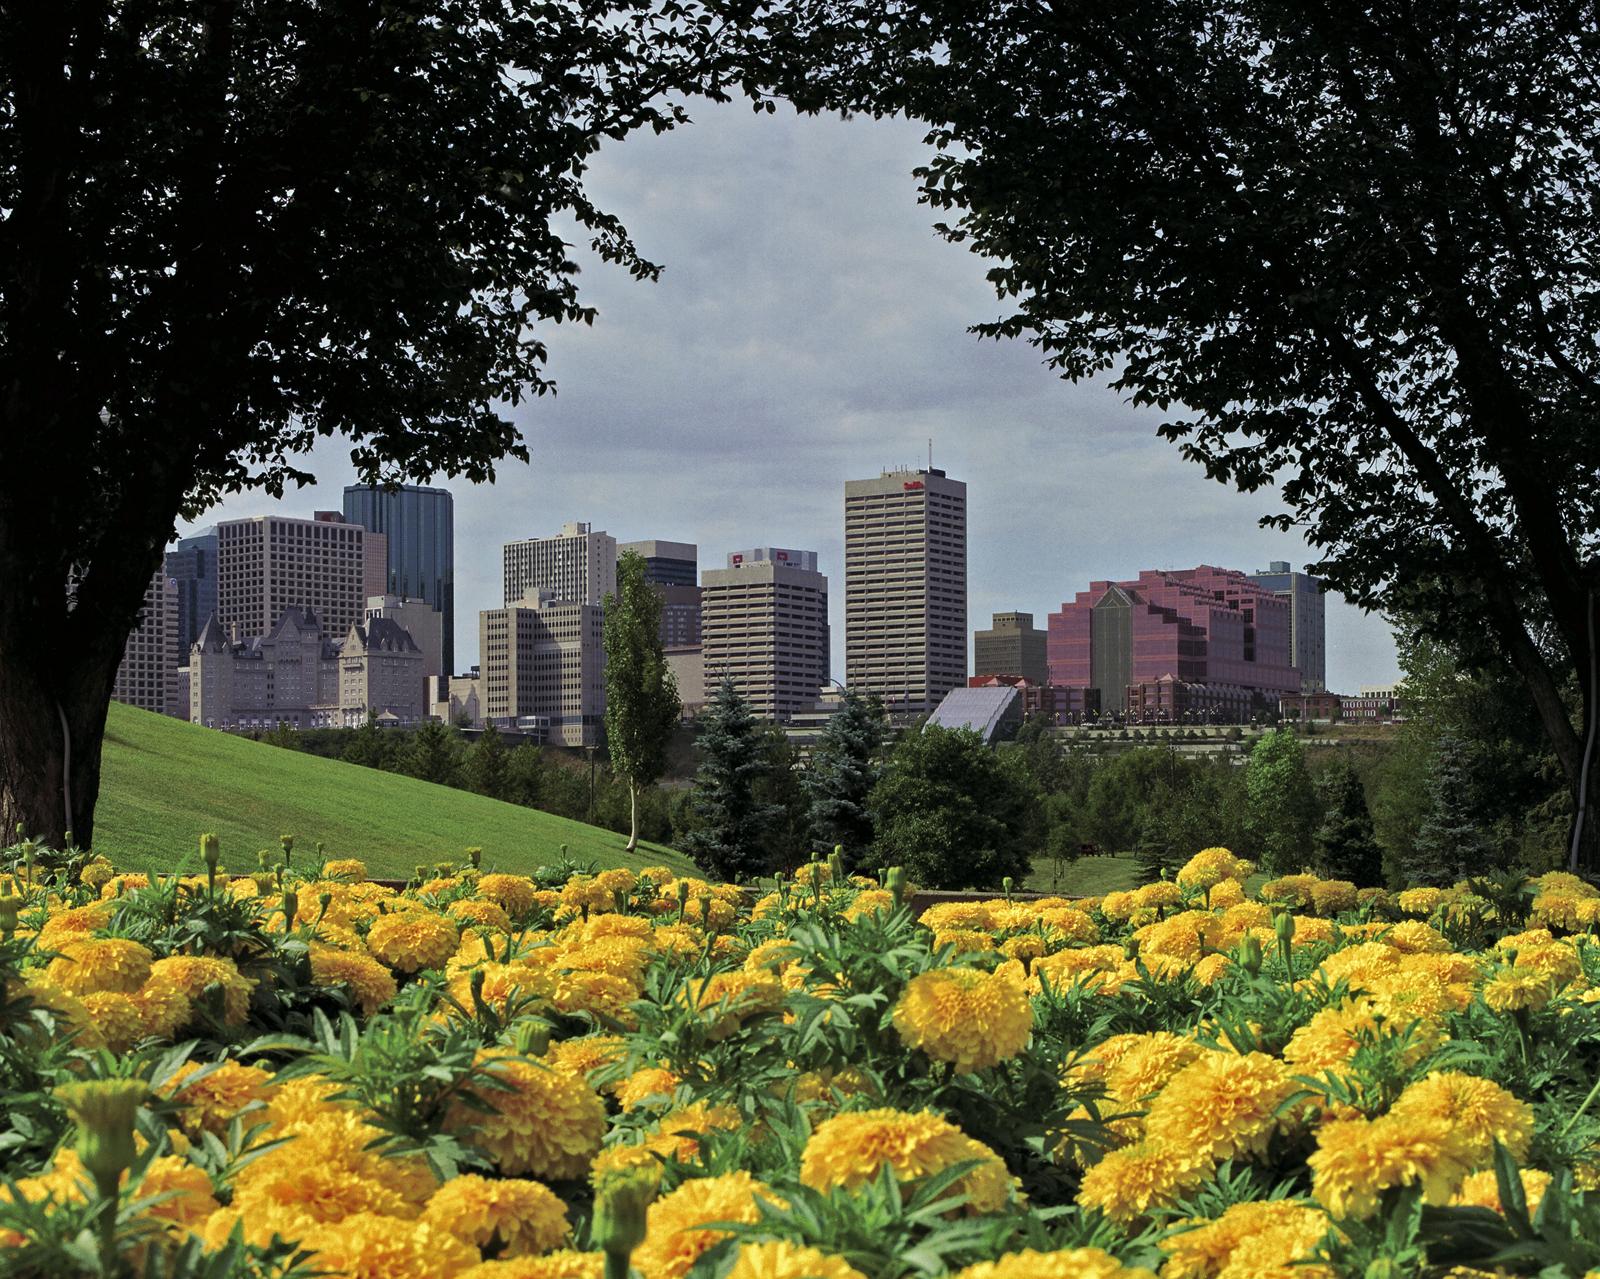 Edmonton-Mums flower bed.jpg